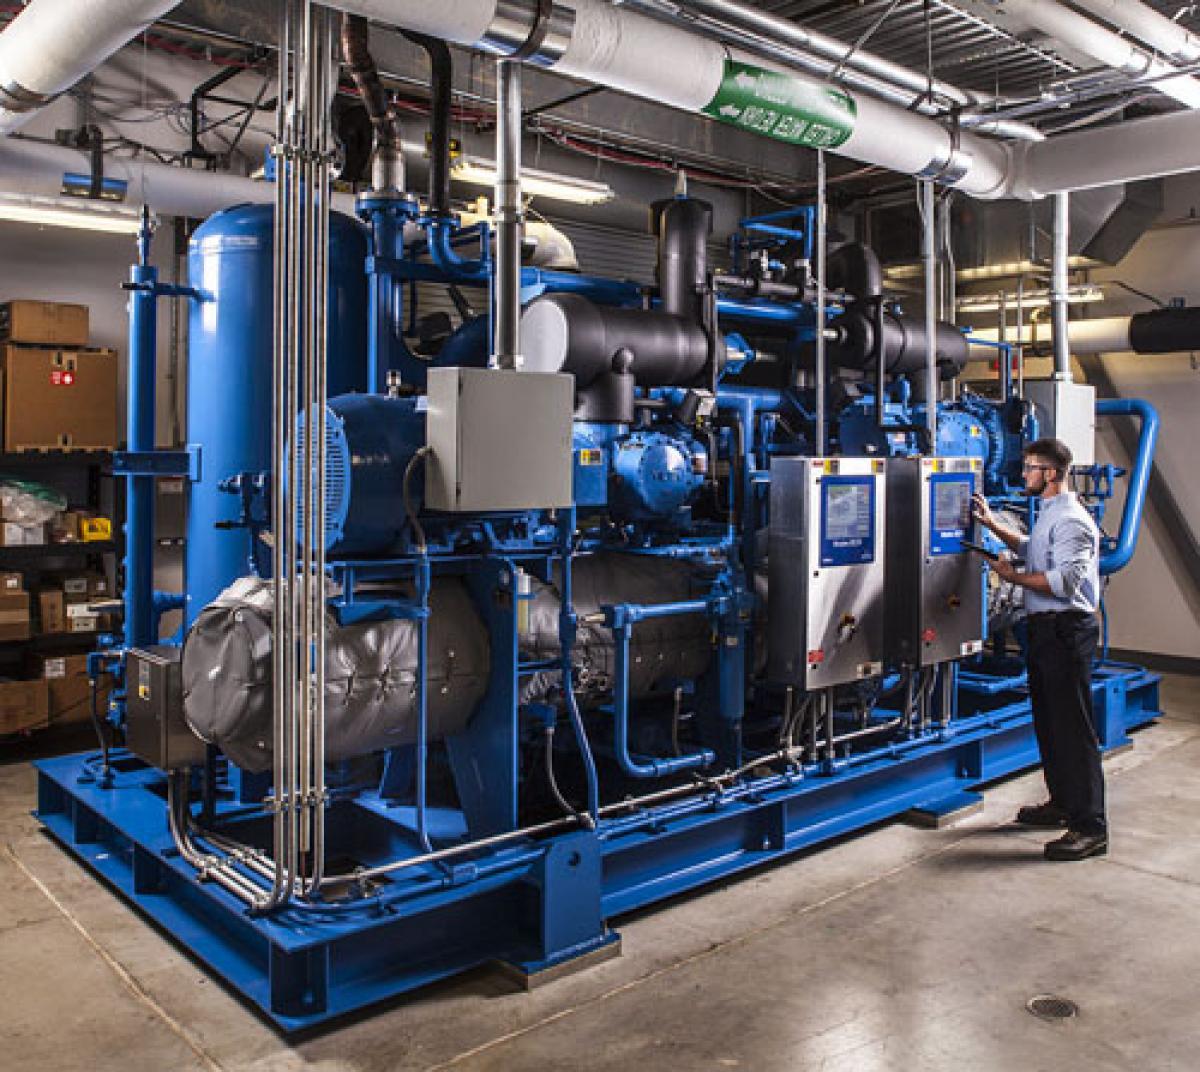 emerson industrial refrigeration